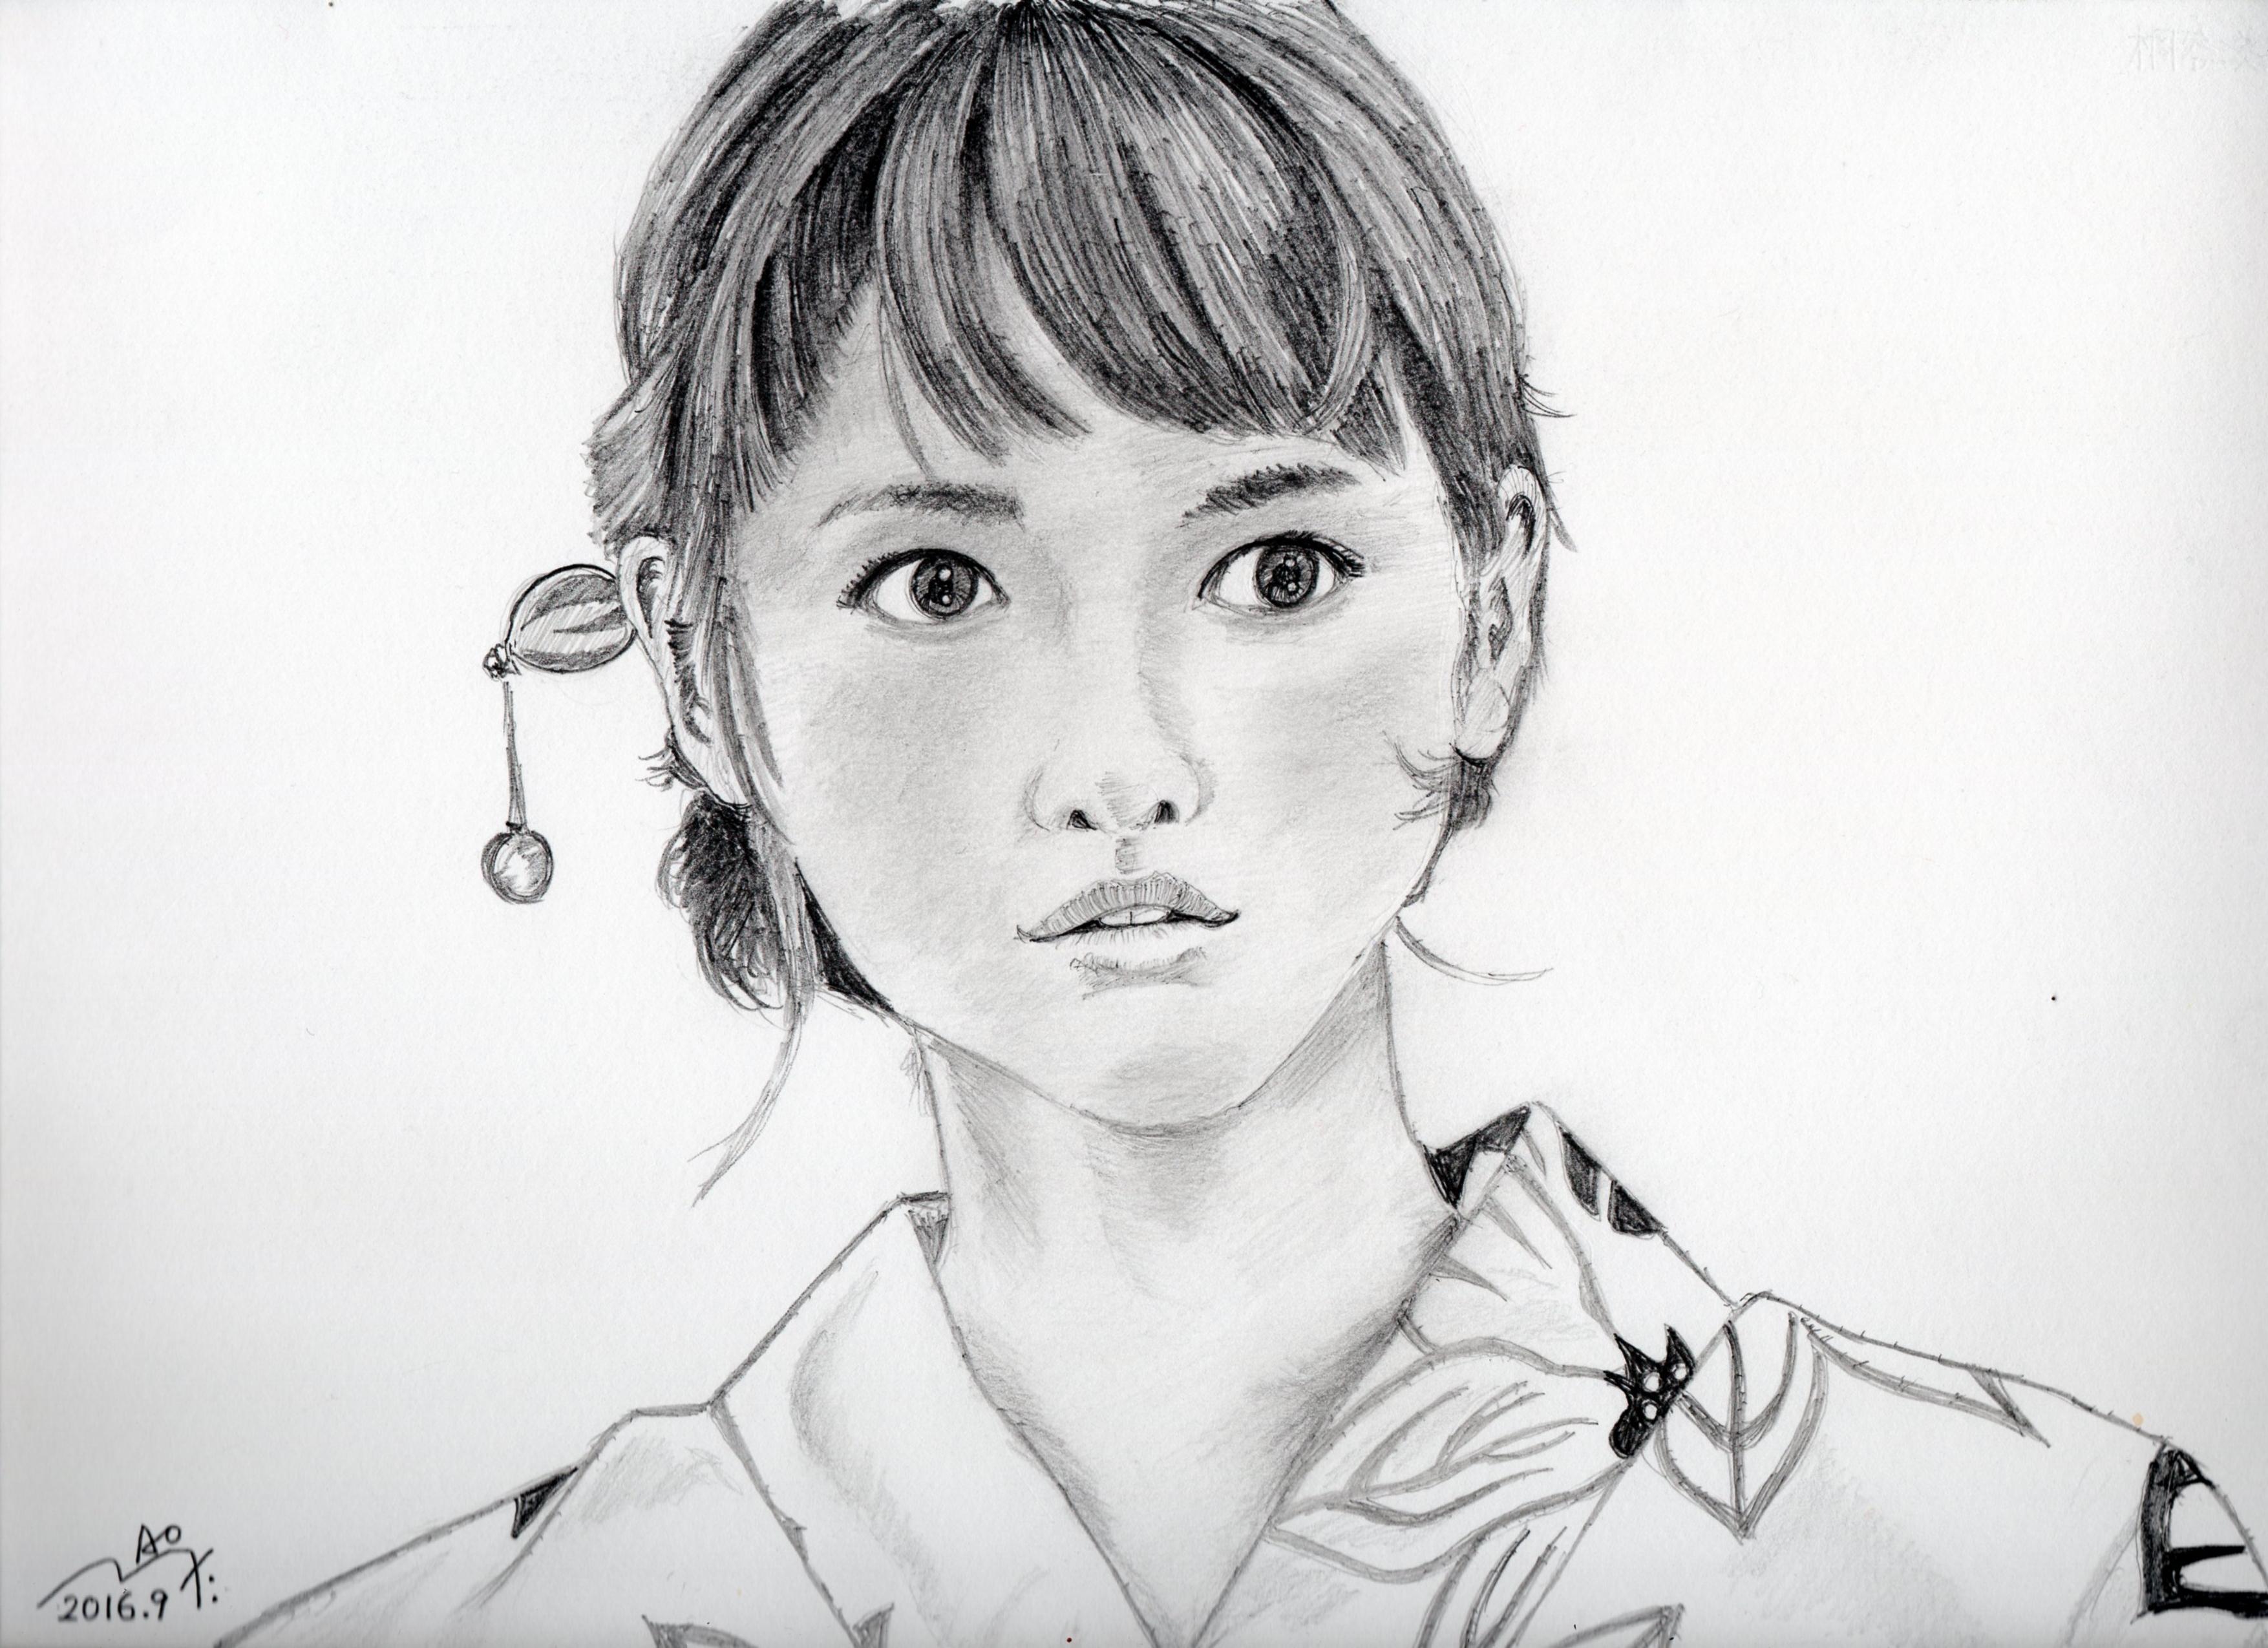 桐谷美玲の浴衣姿の鉛筆画似顔絵